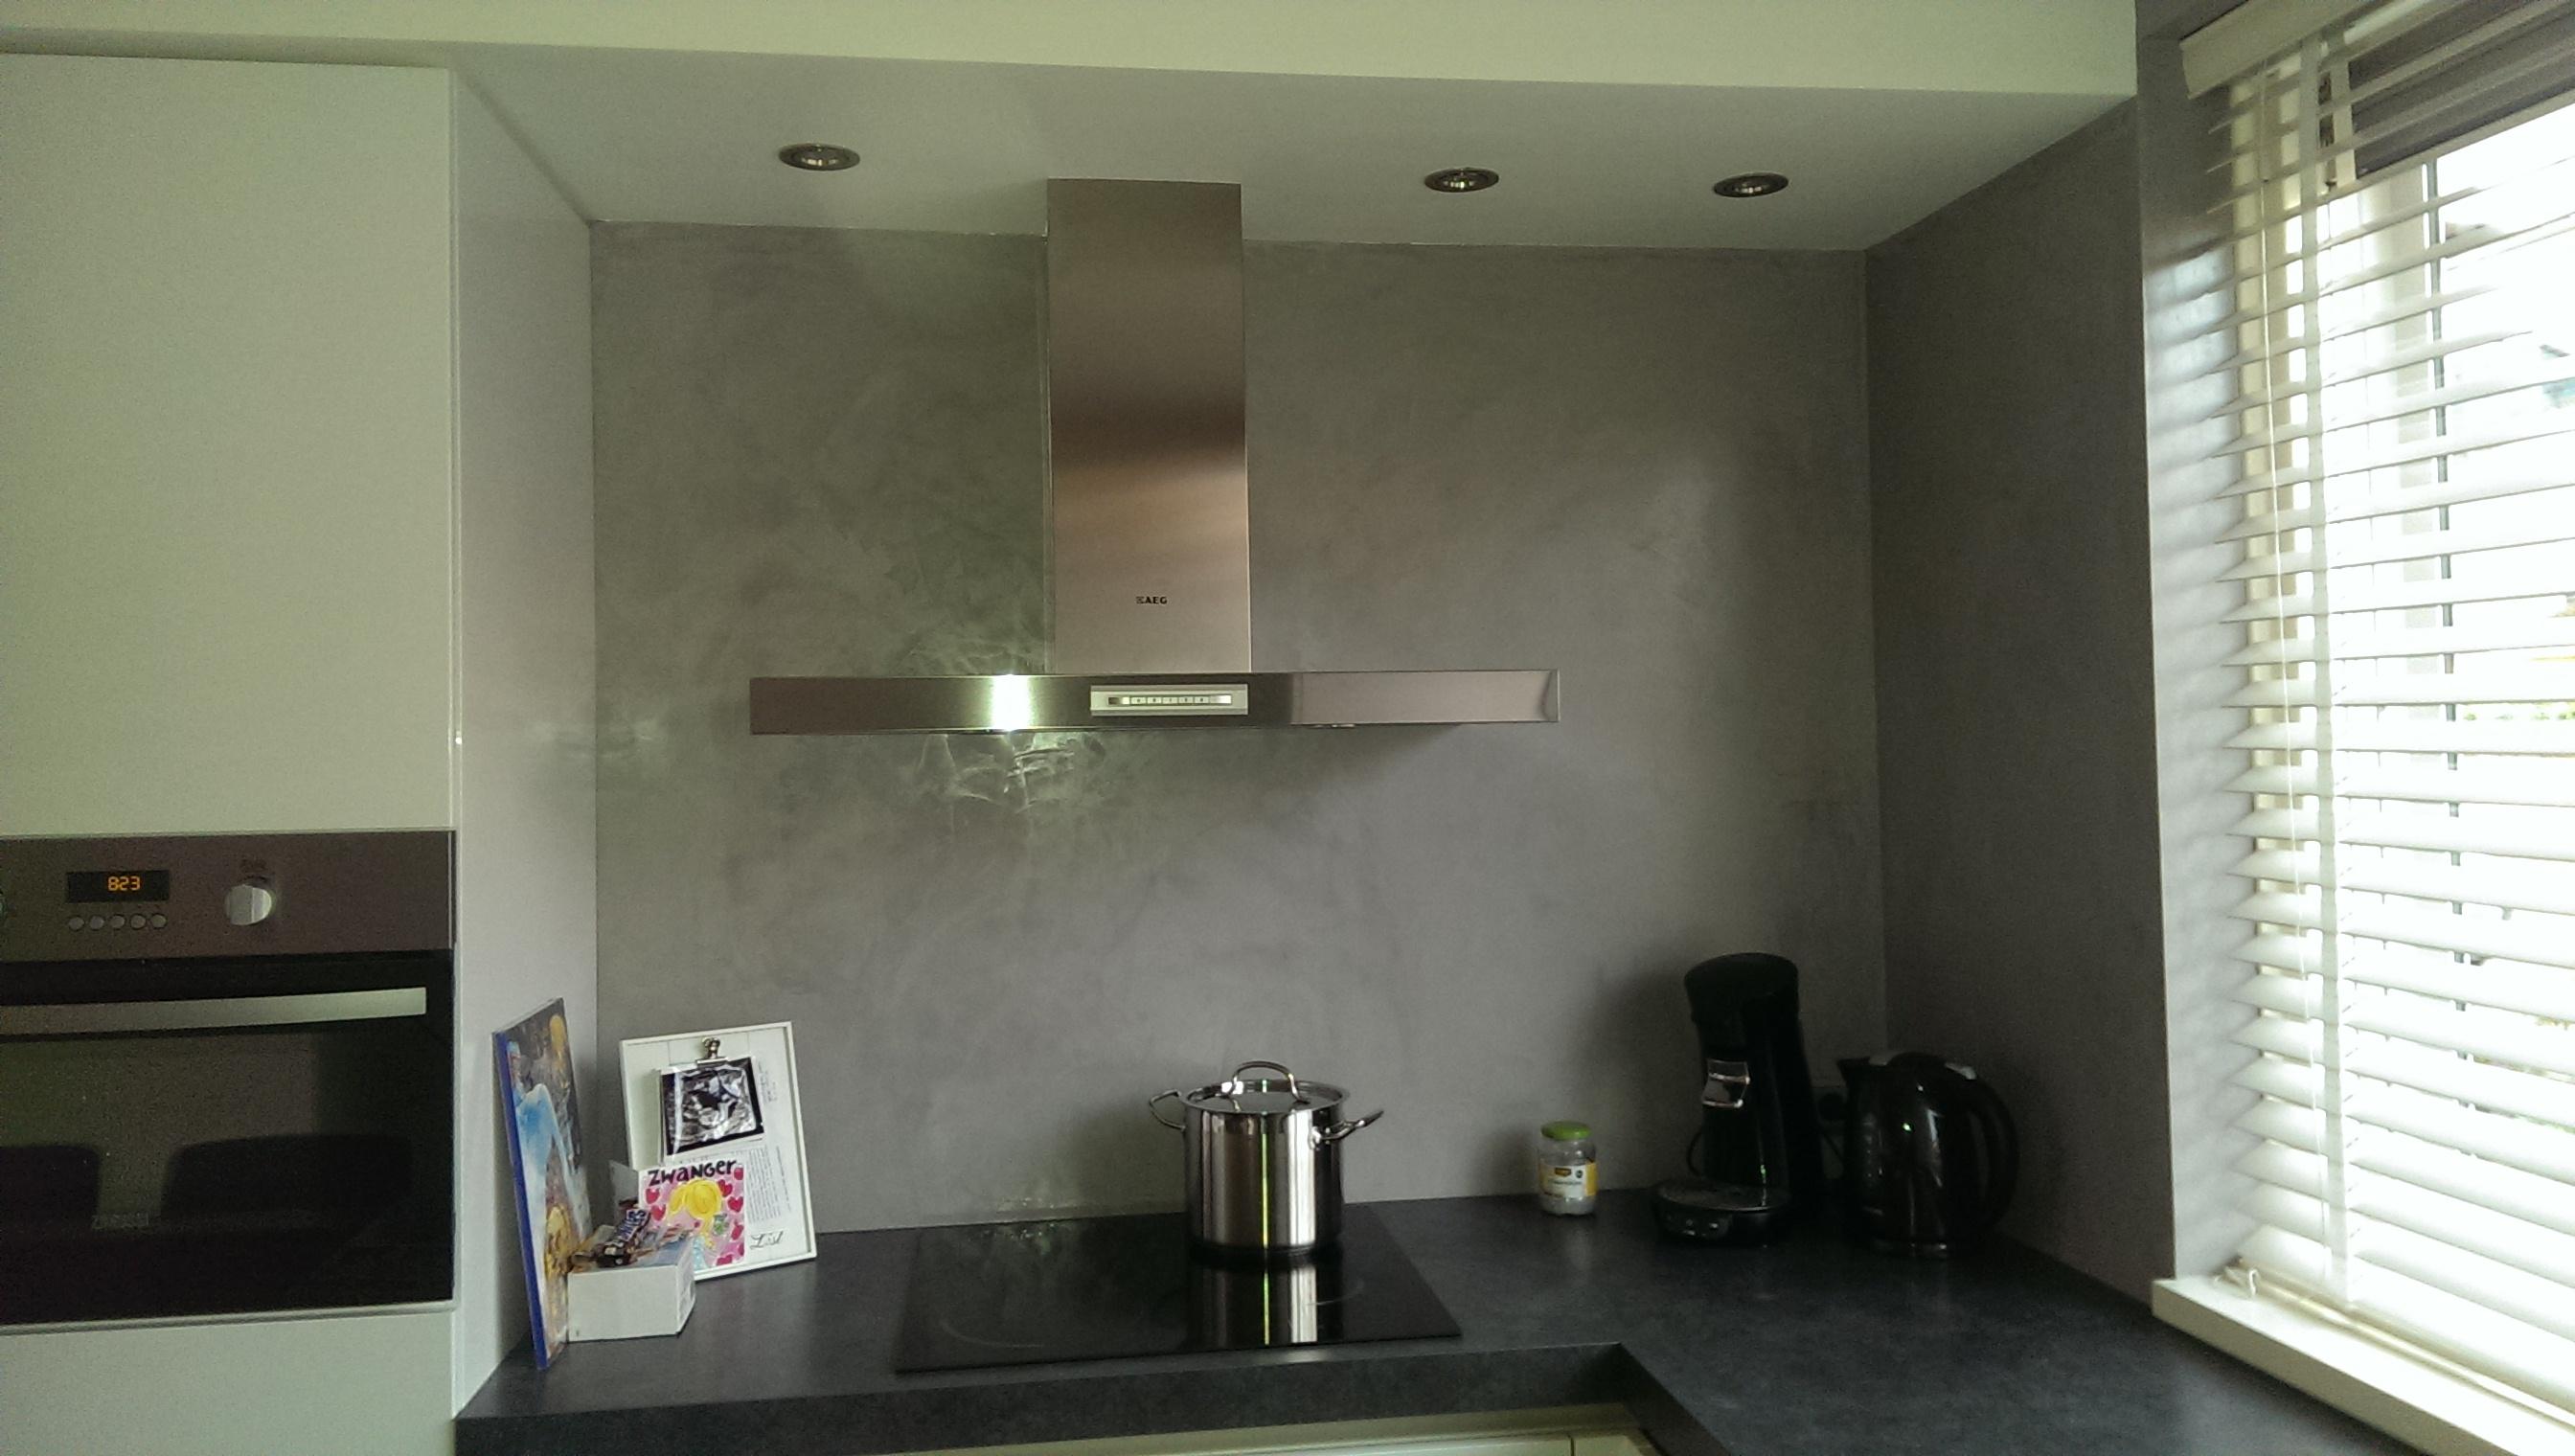 Achterwand Keuken Verven : Keuken verven welke verf